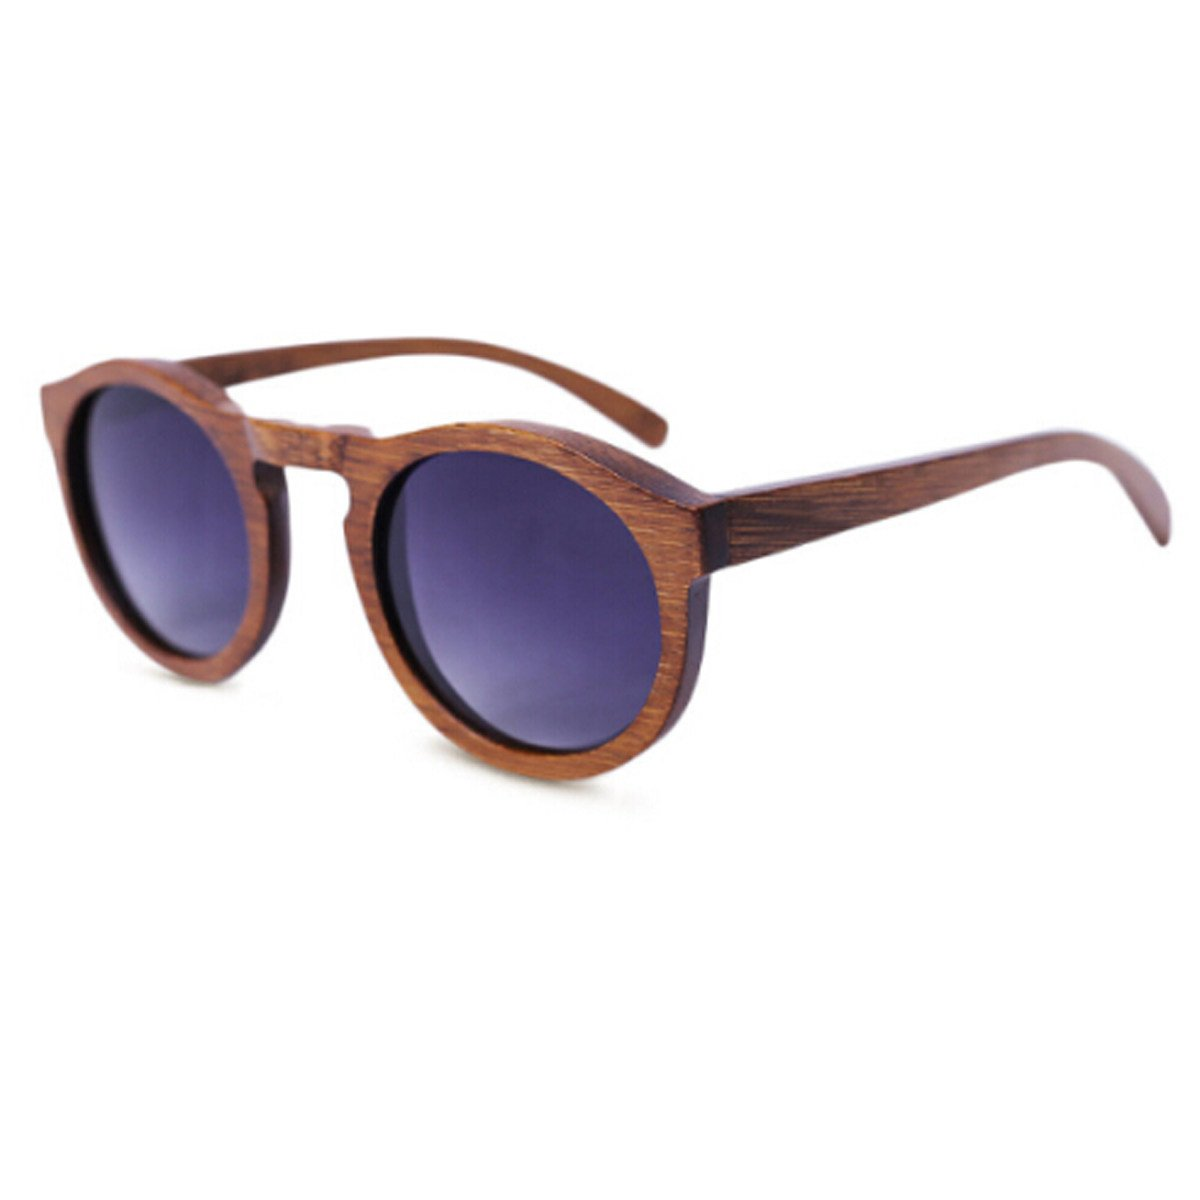 HAOYUXIANG / Mode / Holzrahmen / Holzbeine / Polarisierte / Holz Sonnenbrillen,Red